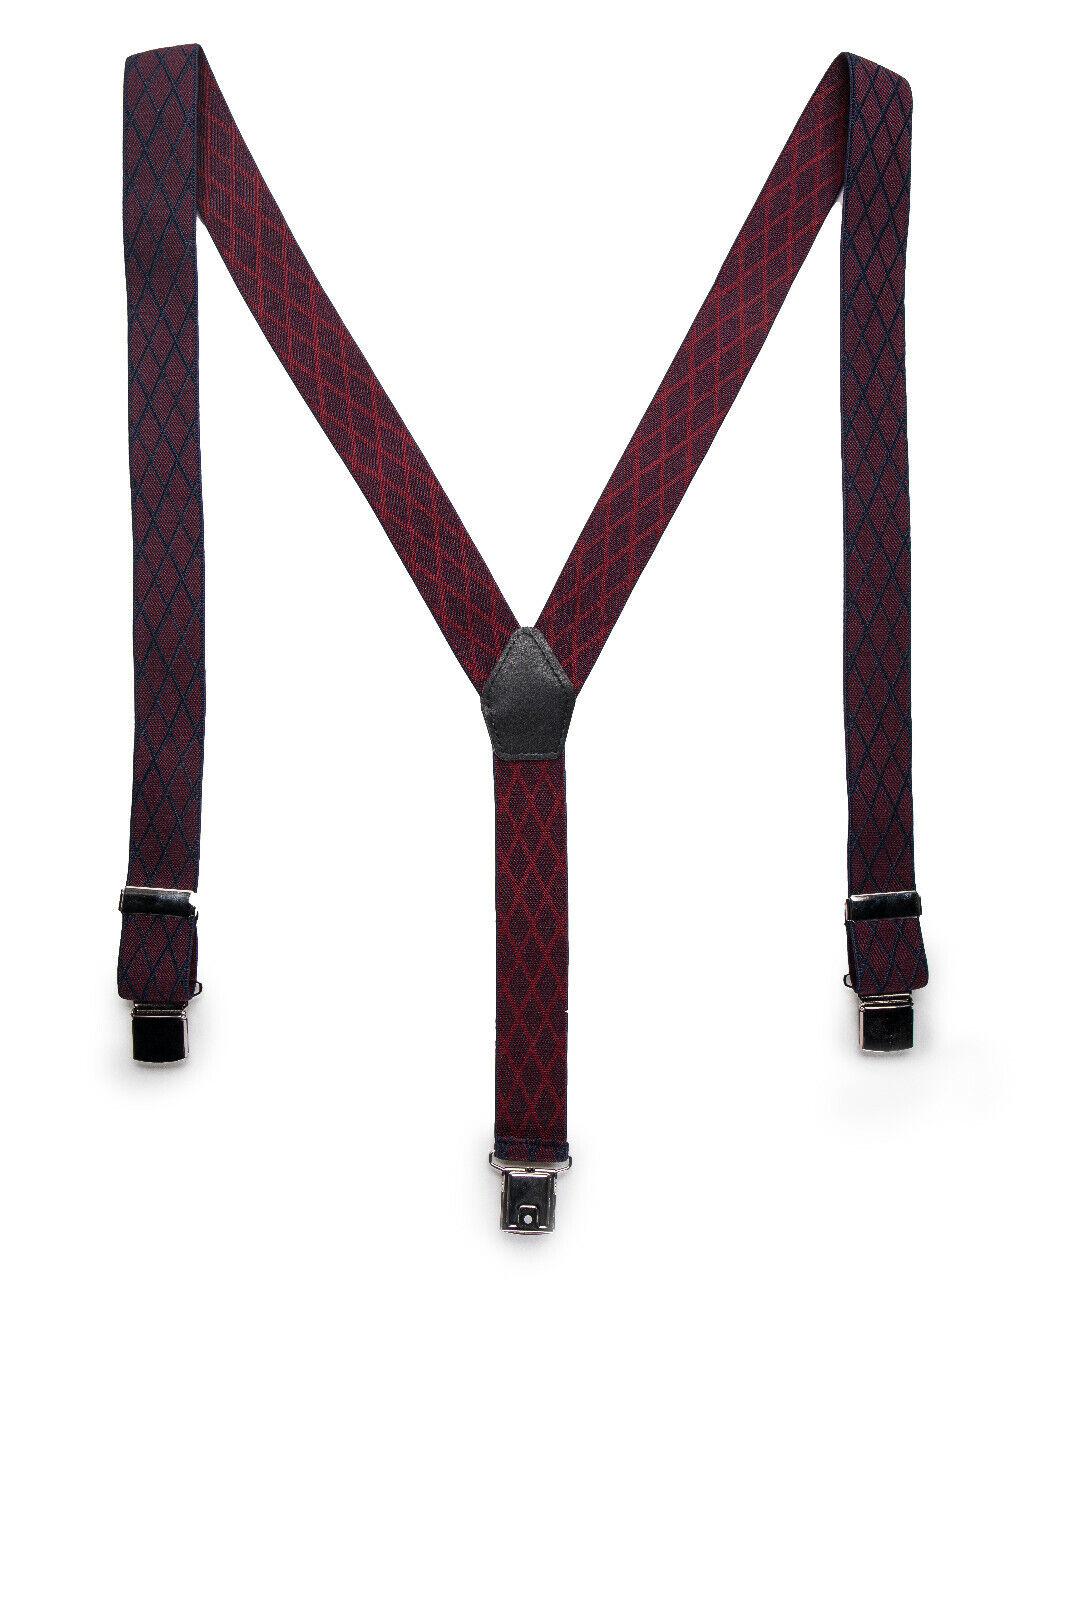 Clip Elegant Vegan Suspender on Casual Plaid Maroon Elastic Lycra & Adjustable